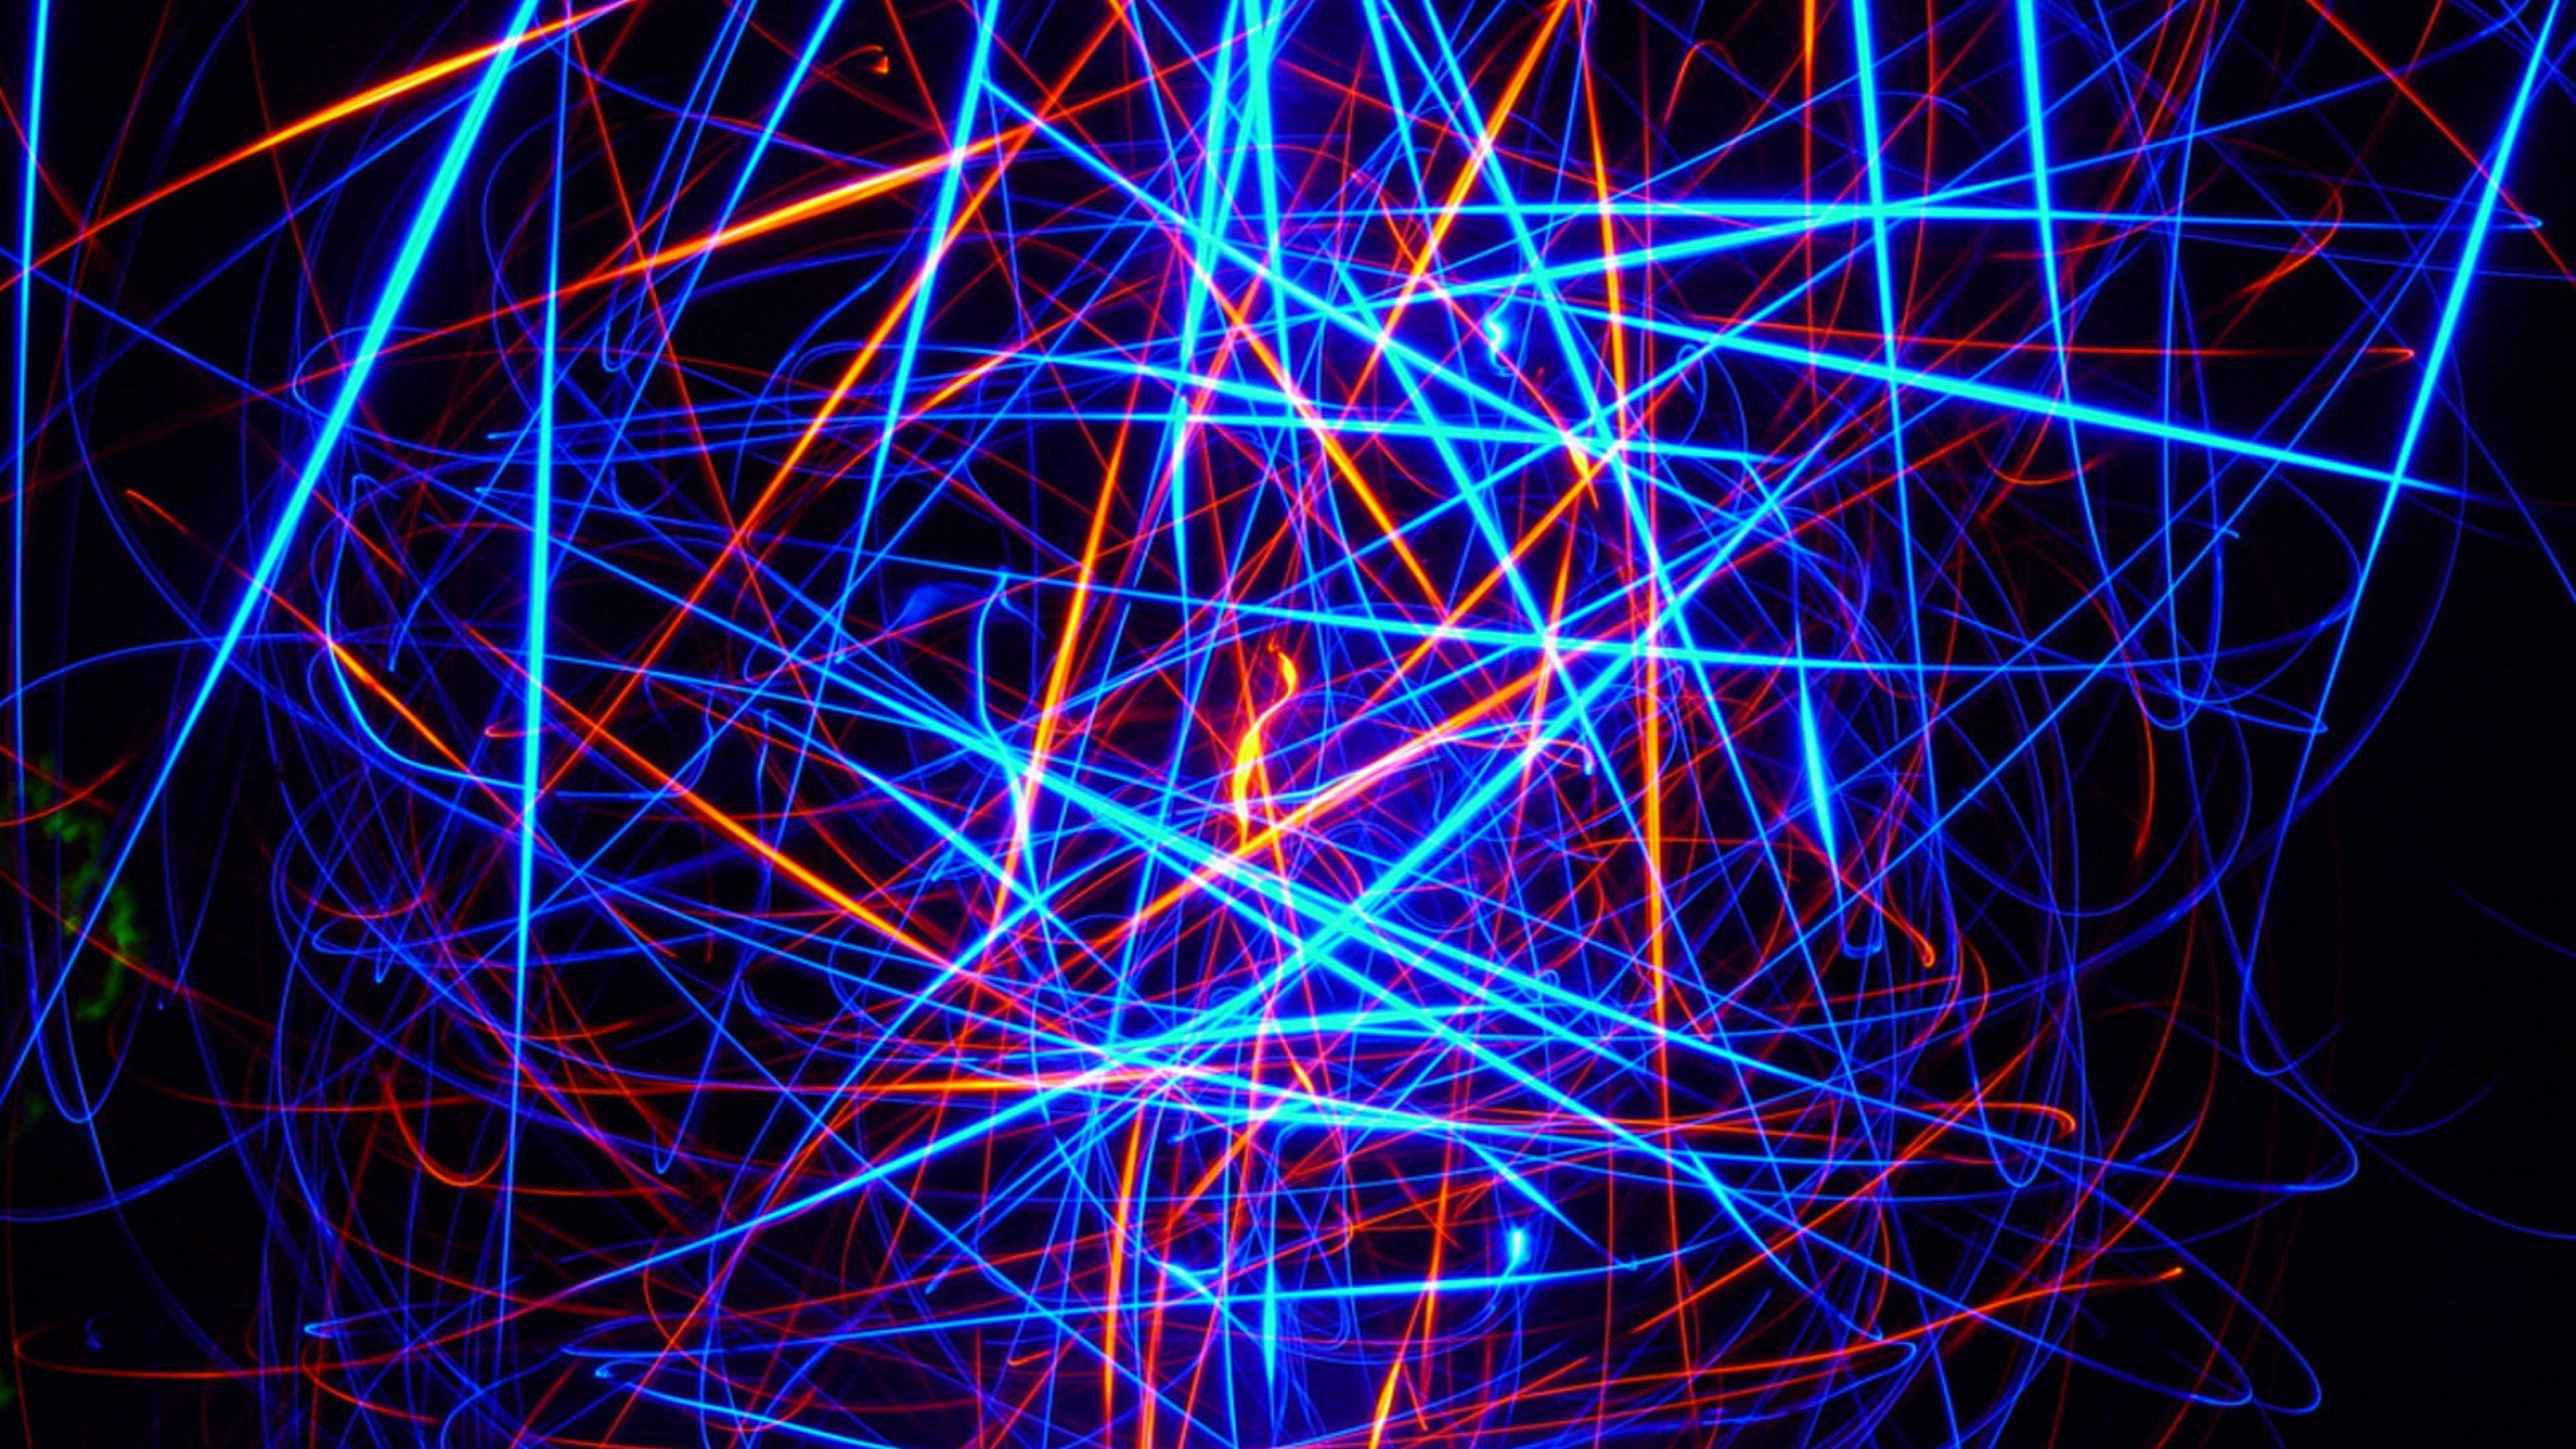 neon lights wallpaper - photo #17